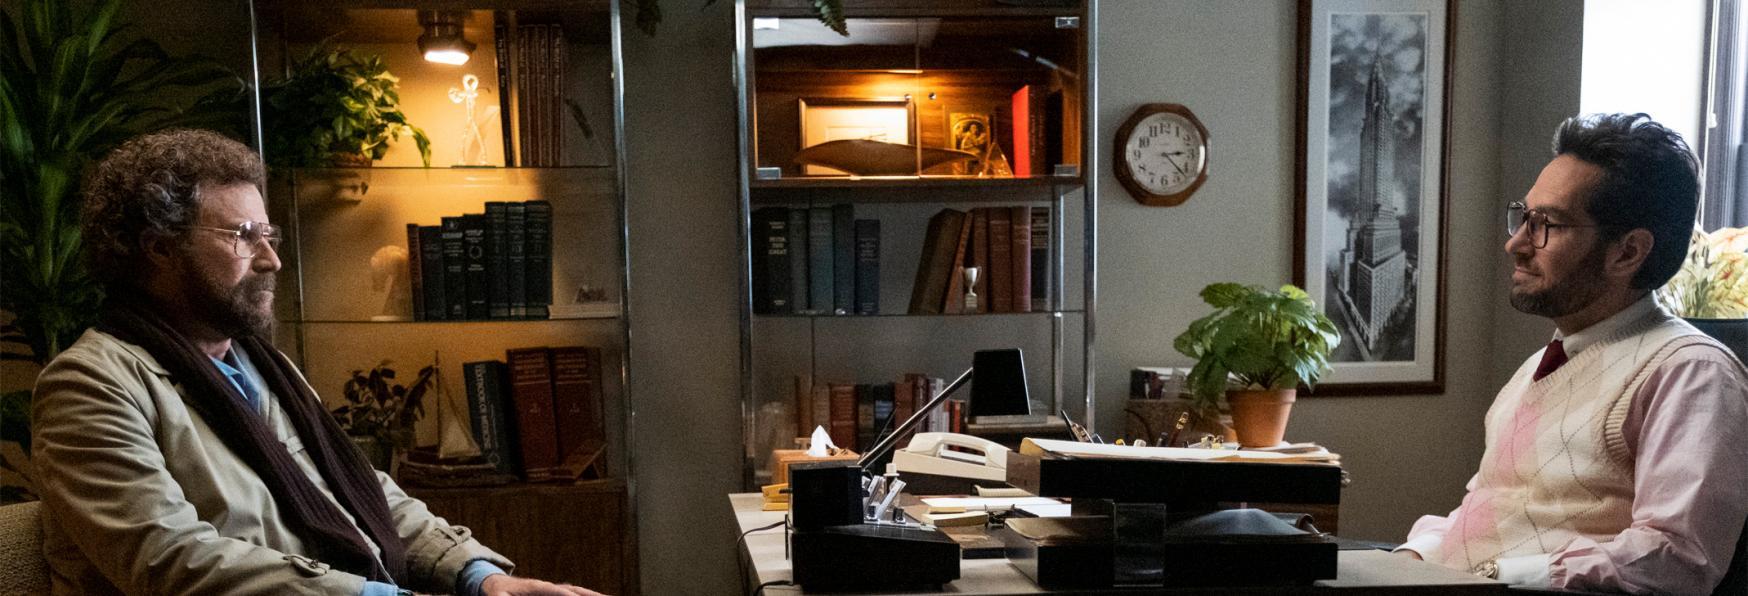 The Shrink Next Door: il Teaser Trailer della nuova Serie TV targata Apple